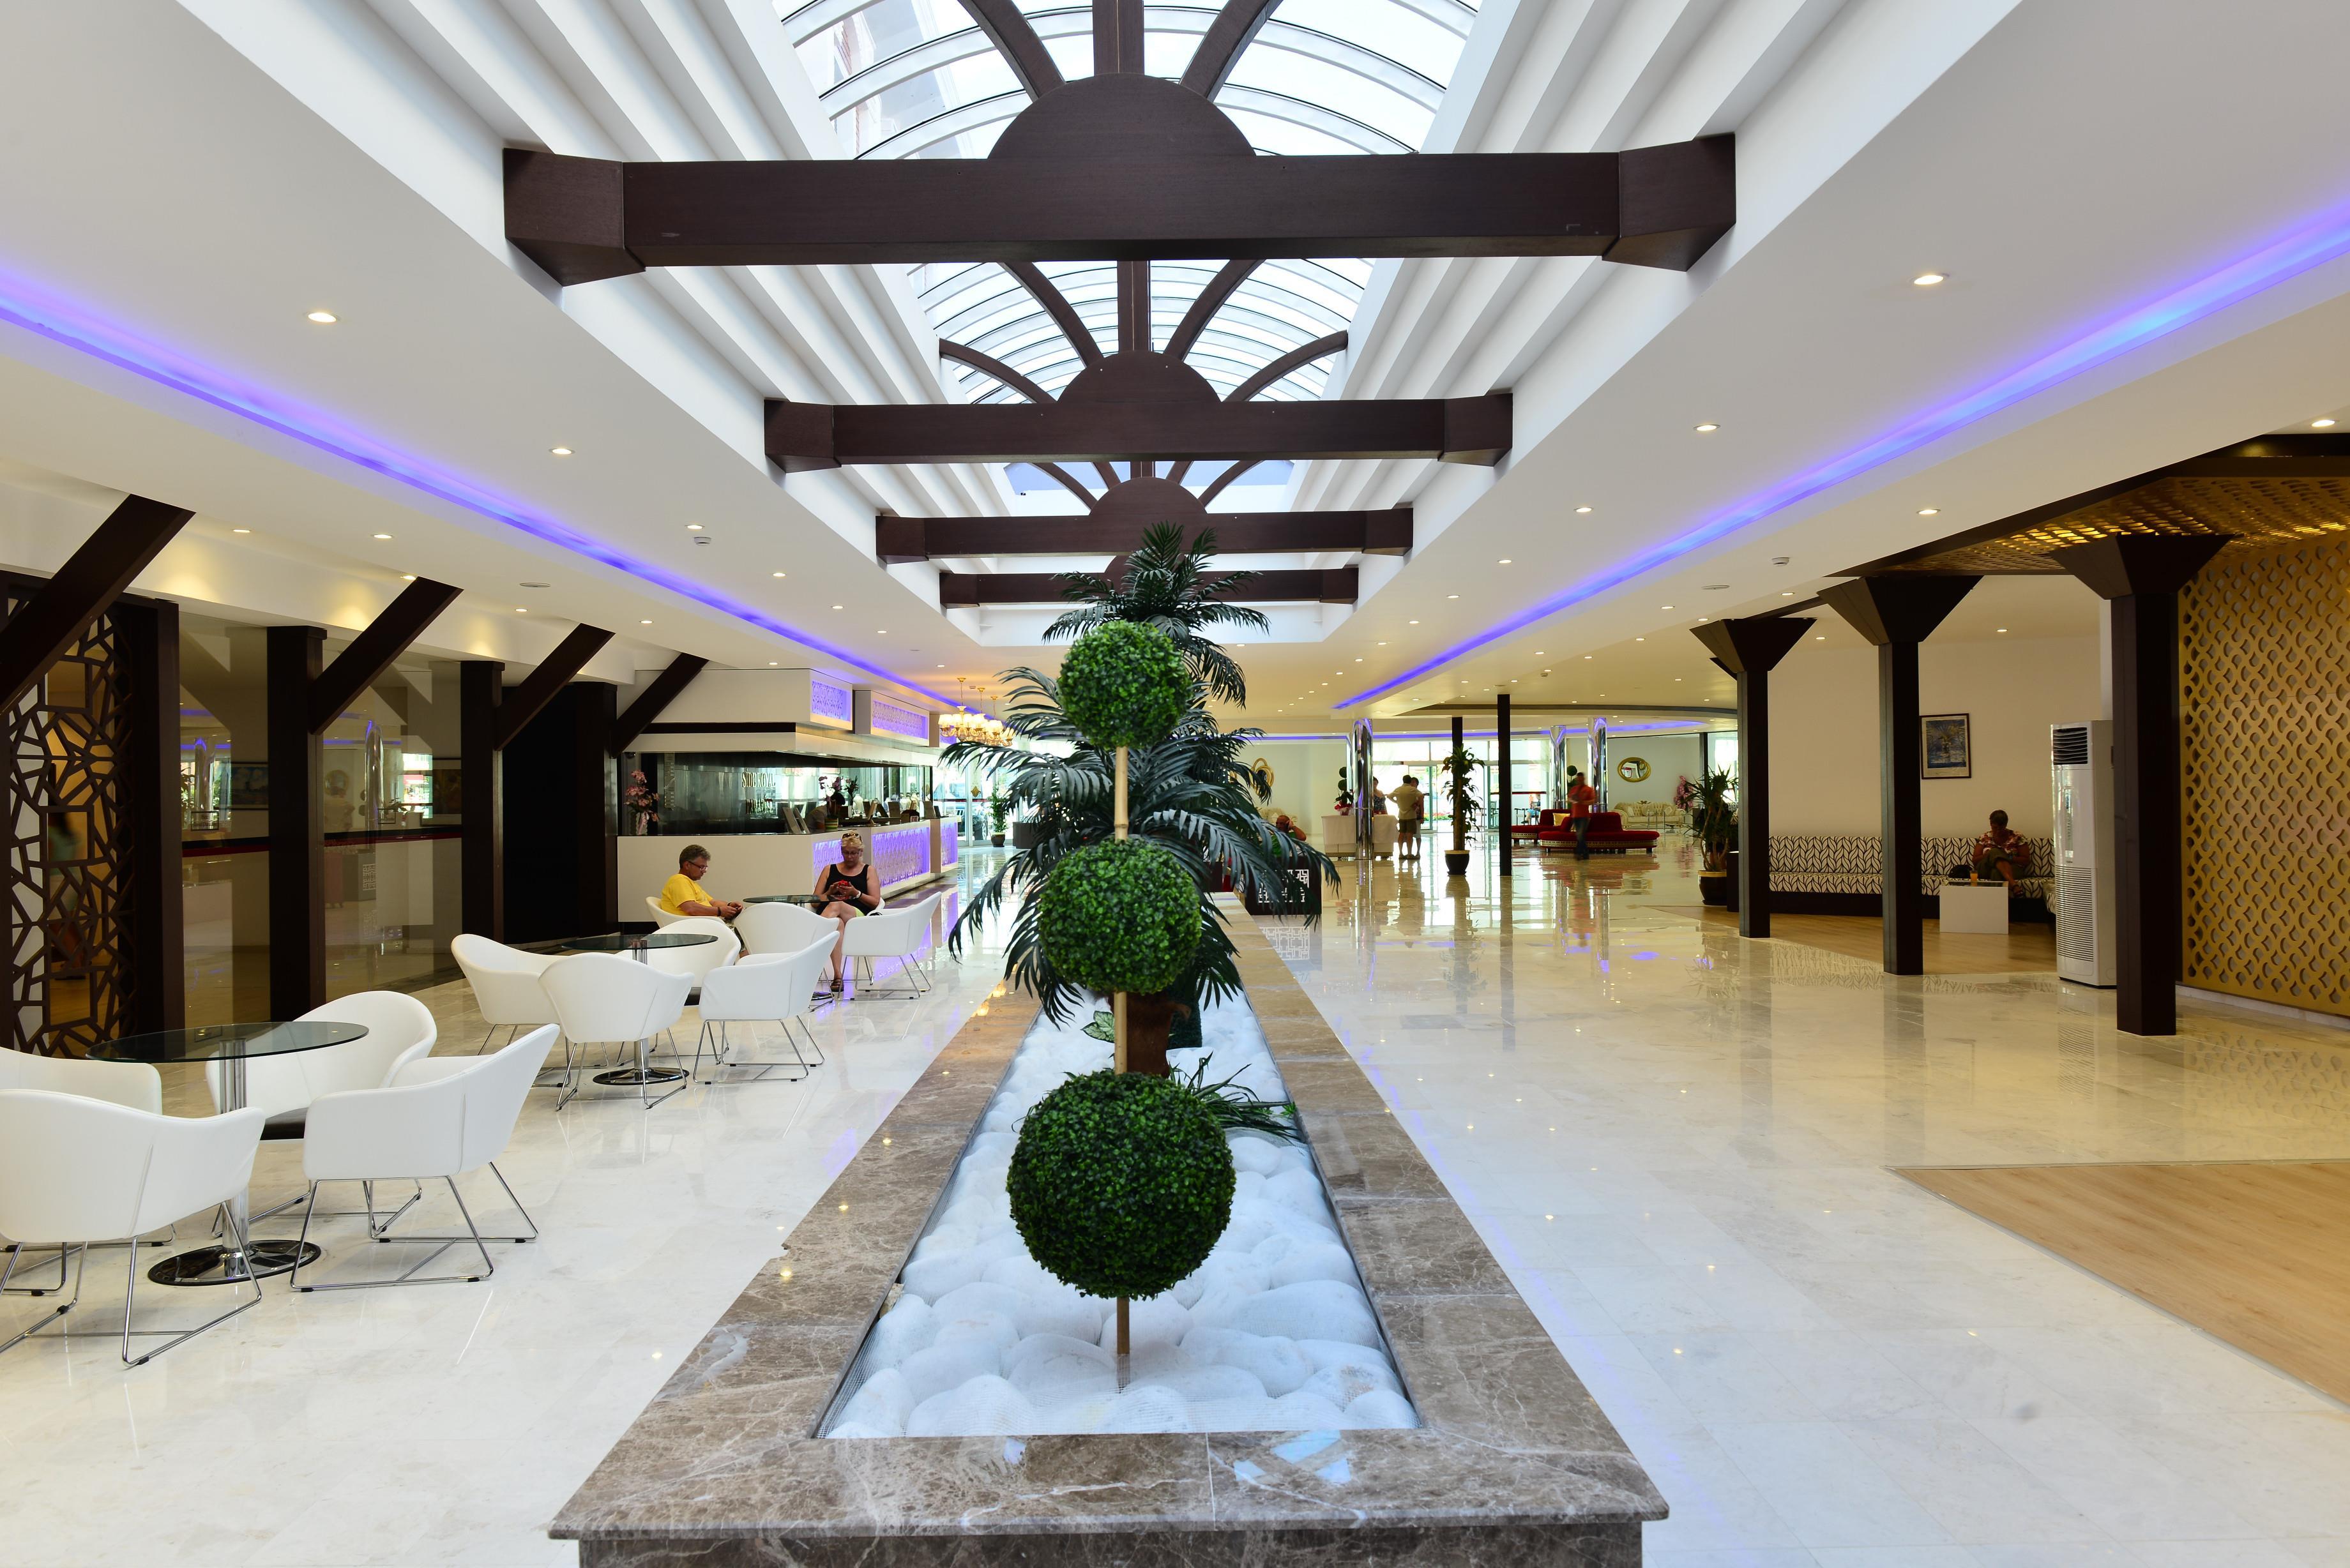 http://www.orextravel.sk/OREX/hotelphotos/side-royal-paradise-general-0026.jpg